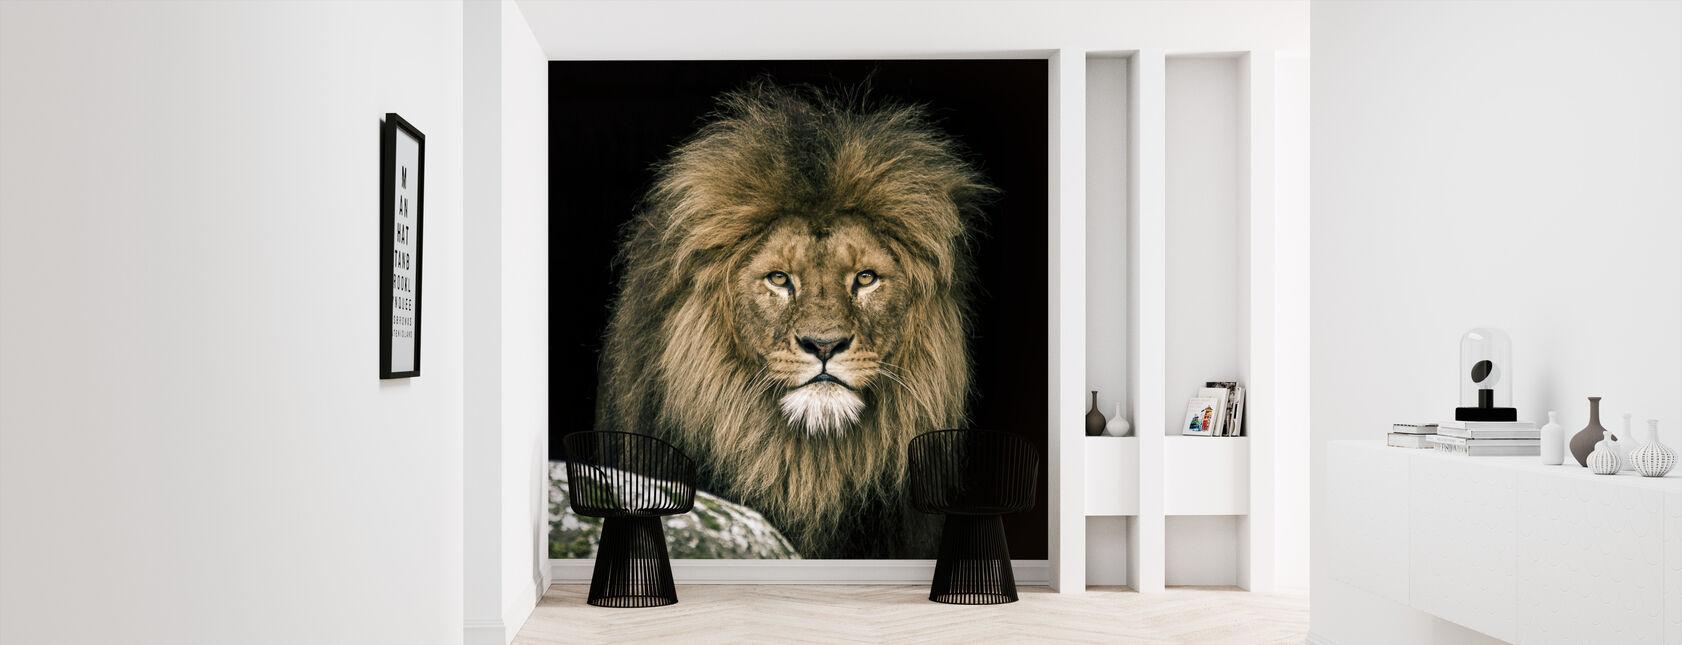 Lion - Wallpaper - Hallway